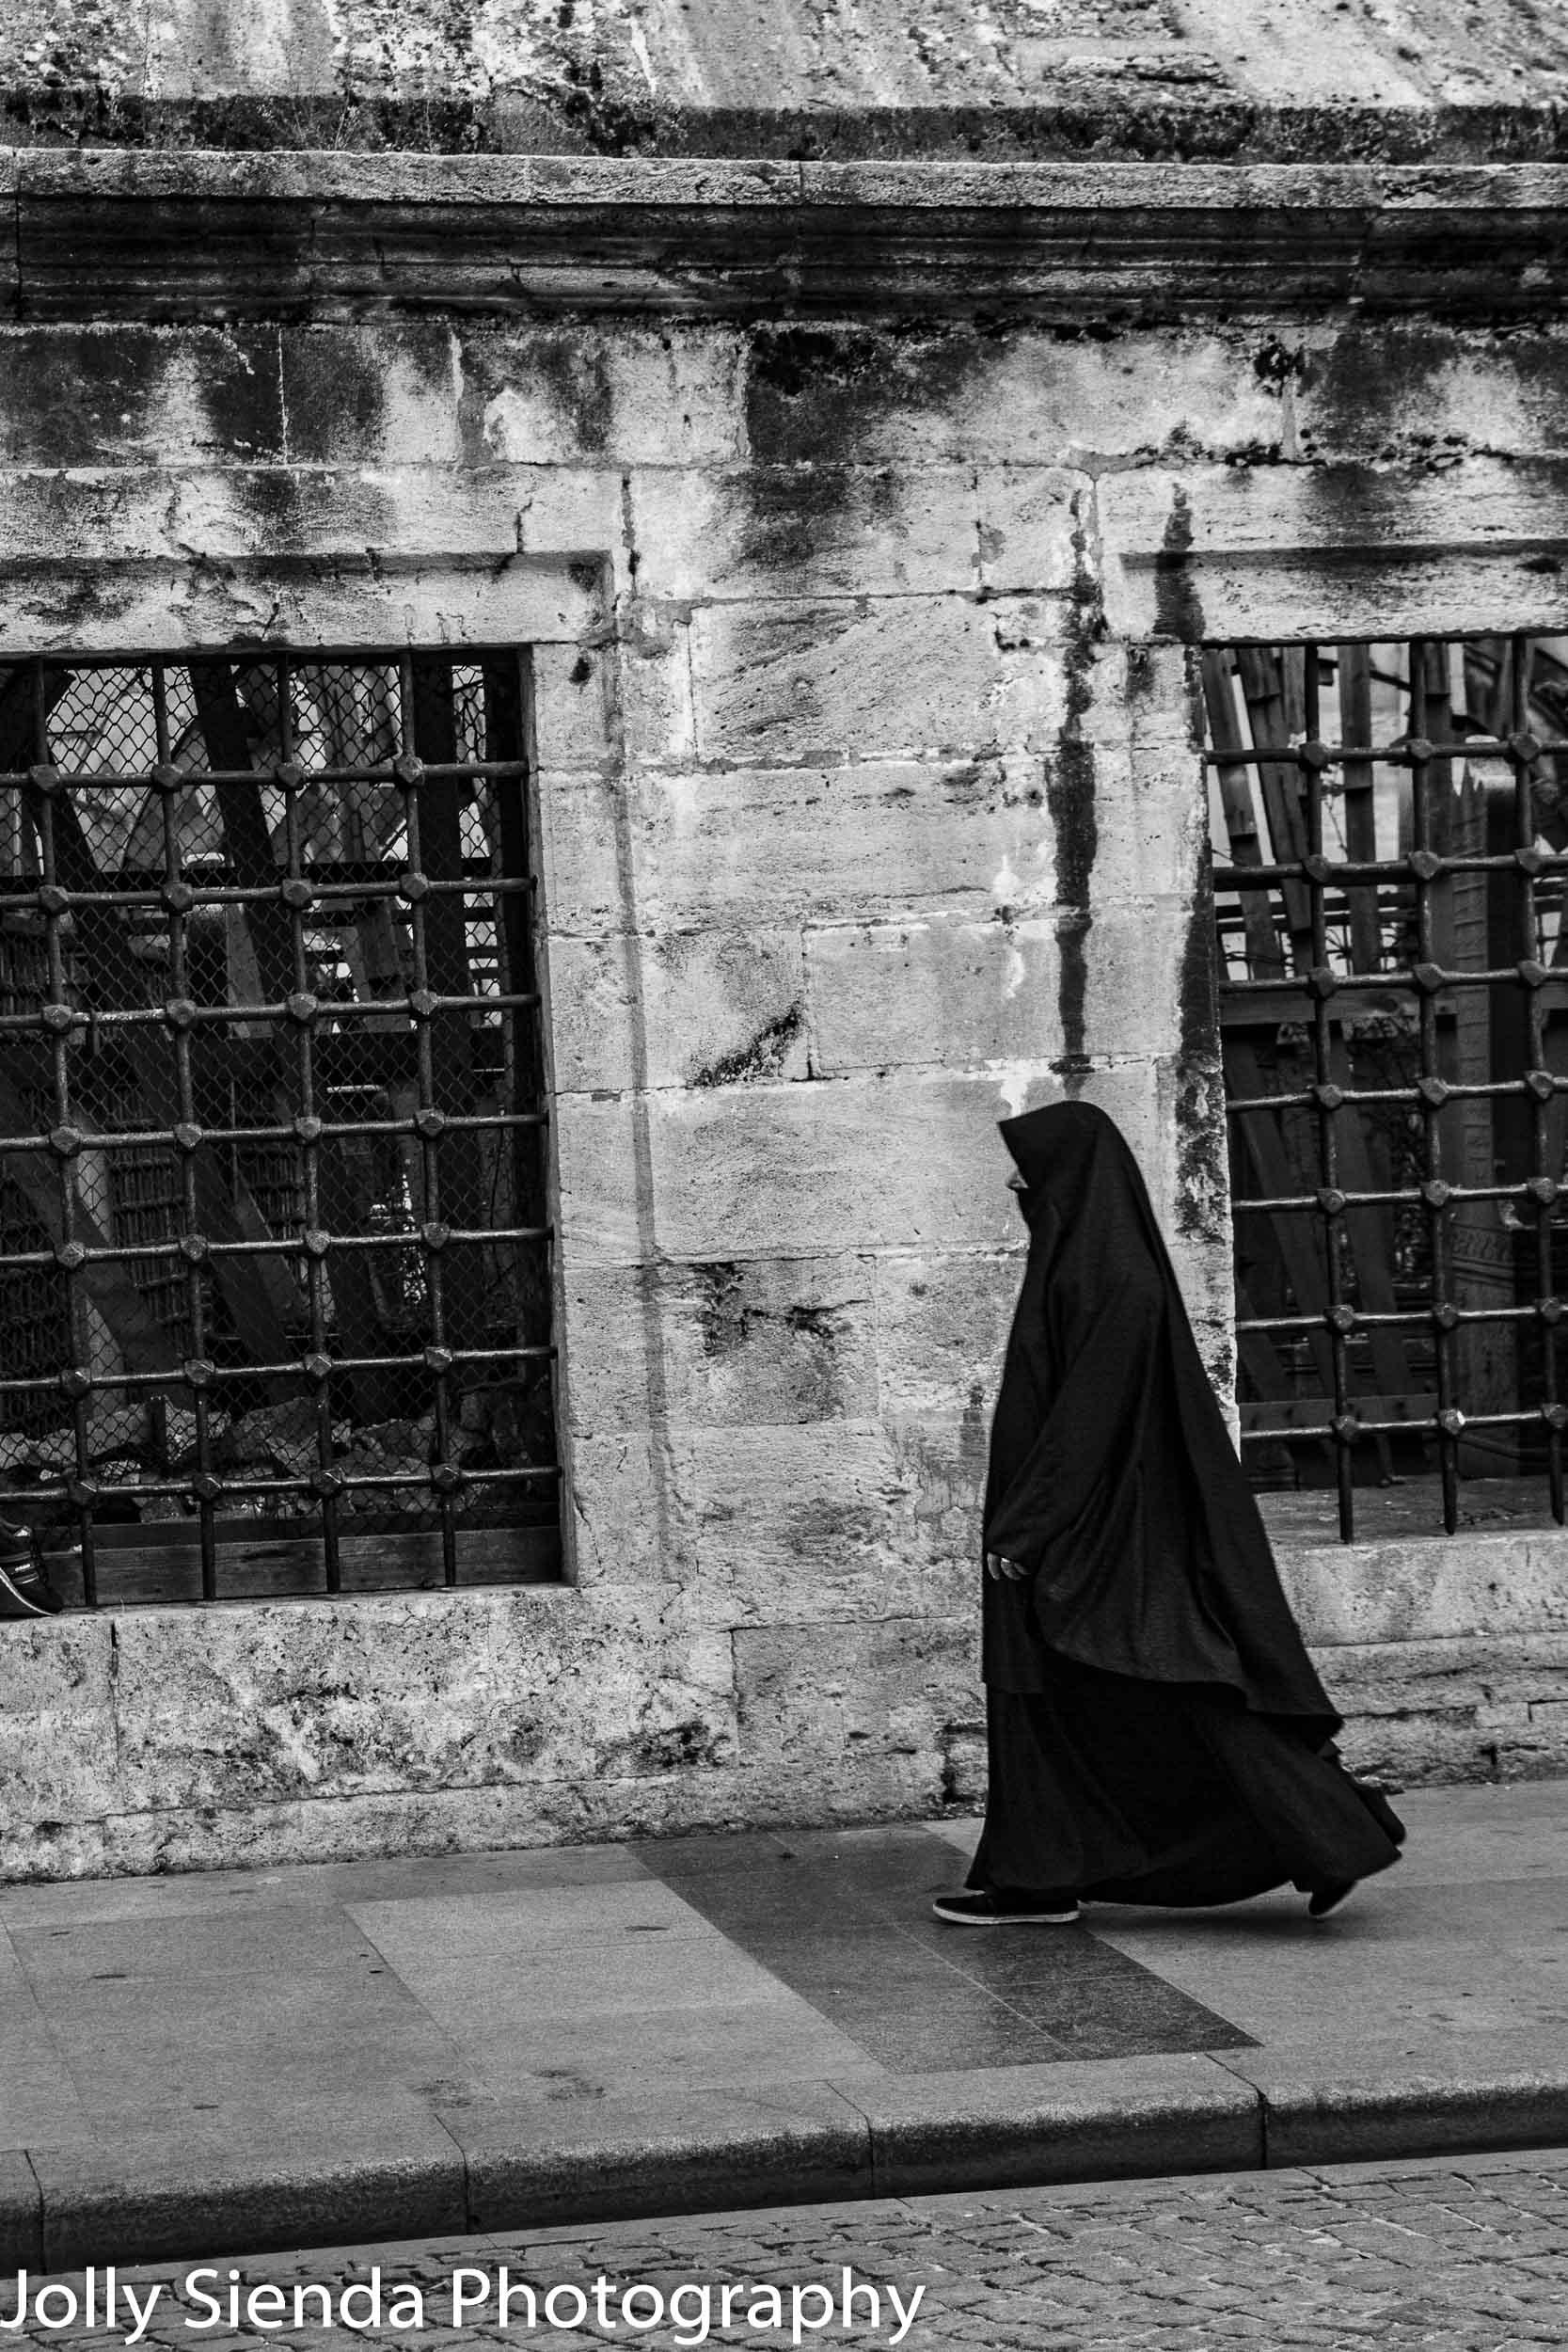 Woman walking on the street wearing a Hijab and Burqa